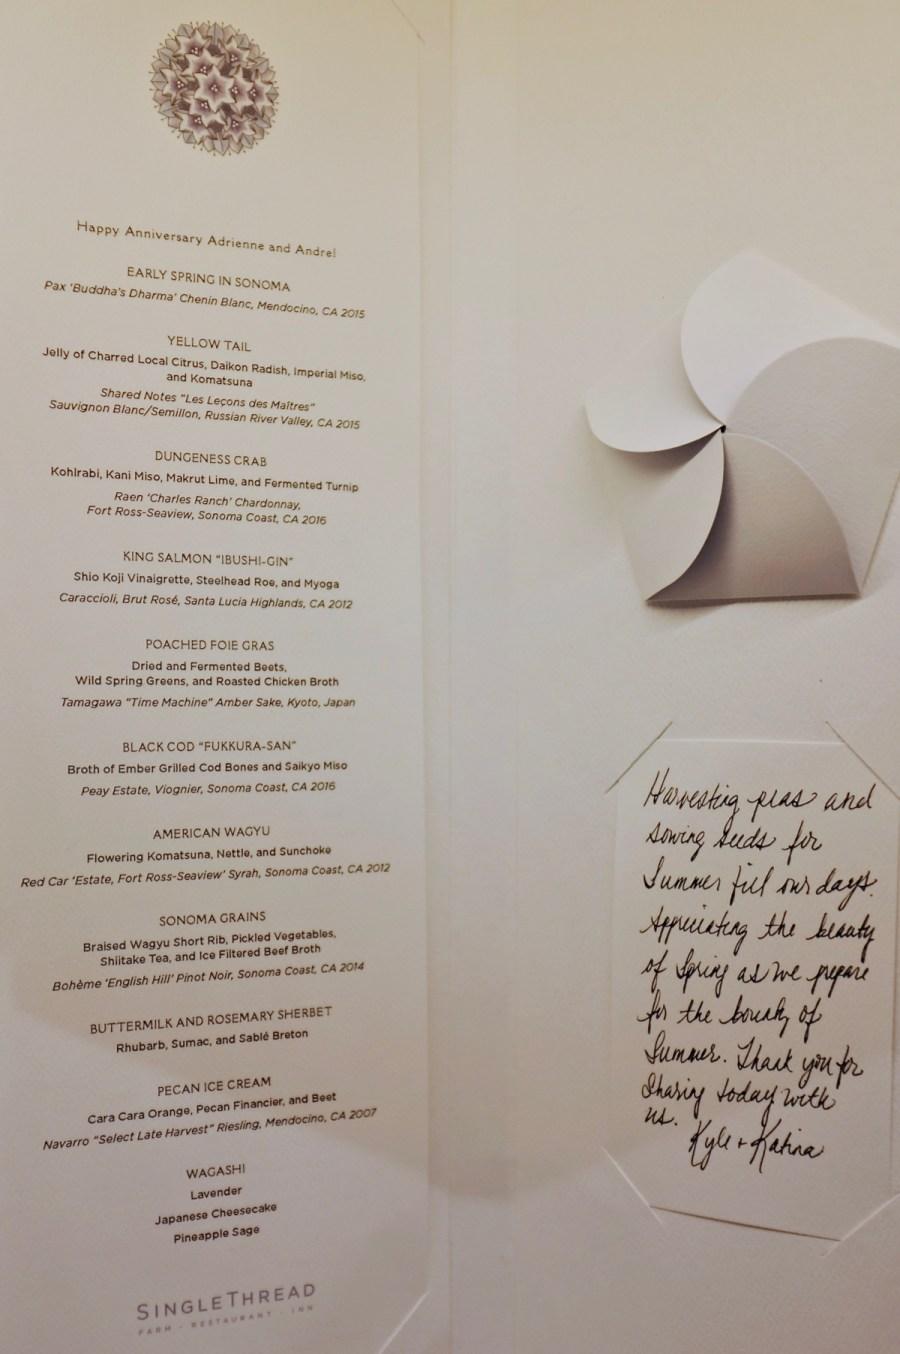 Dinner and Drinks Pairing Menu, April 2018